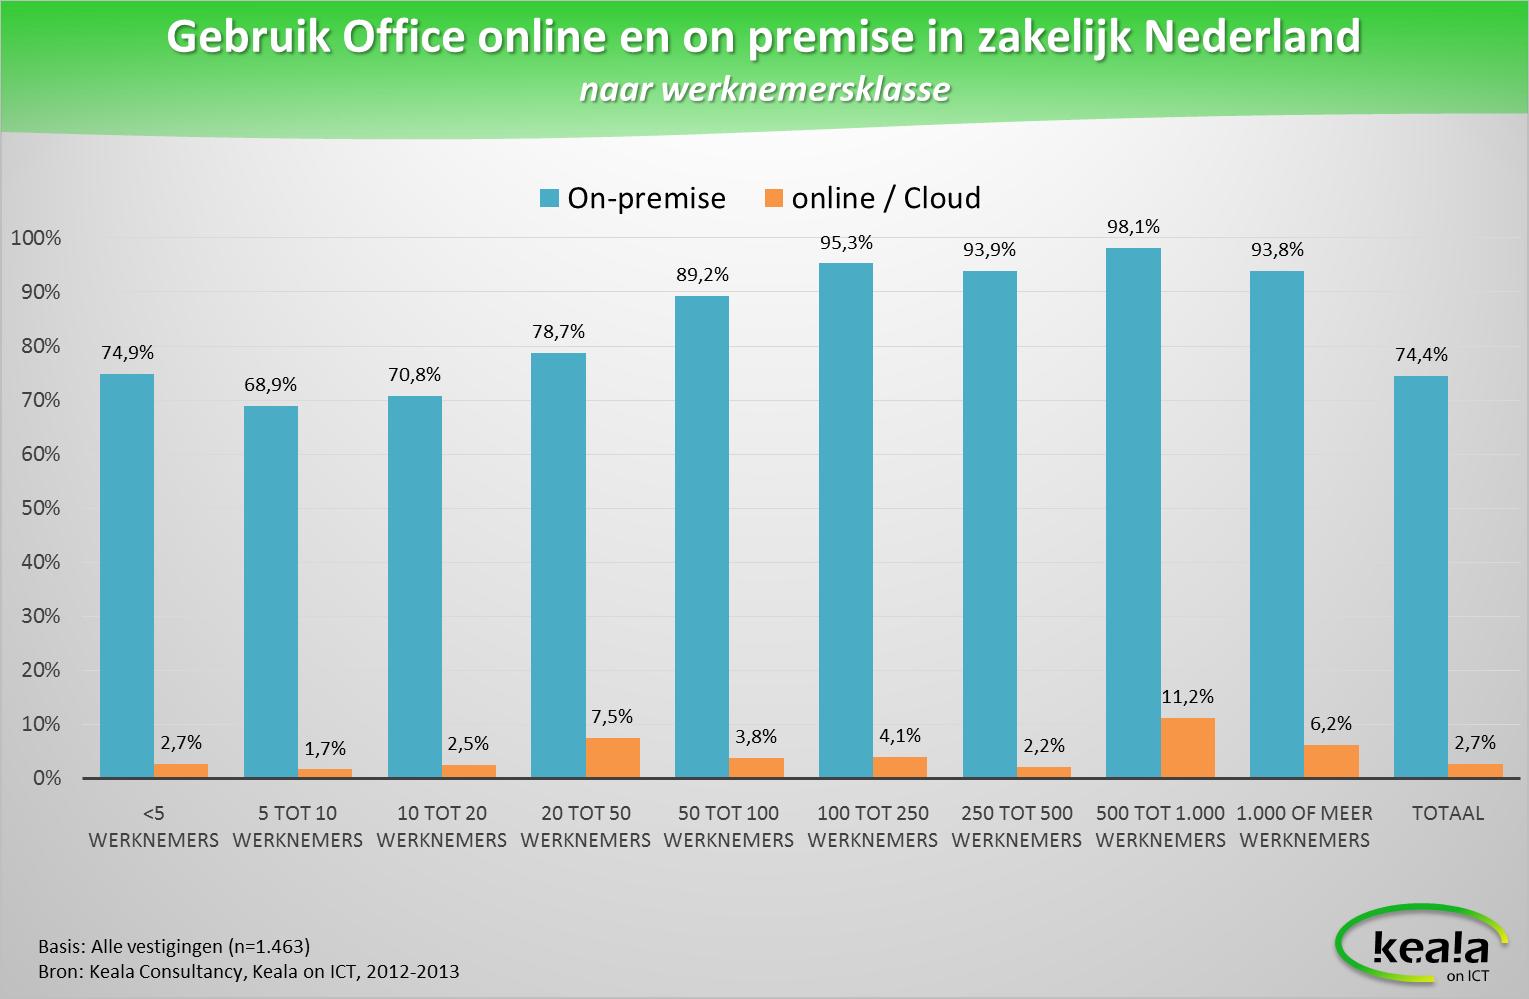 Grafiek - Gebruik Office online en on-premise in zakelijk Nederland (naar werknemersklasse).png